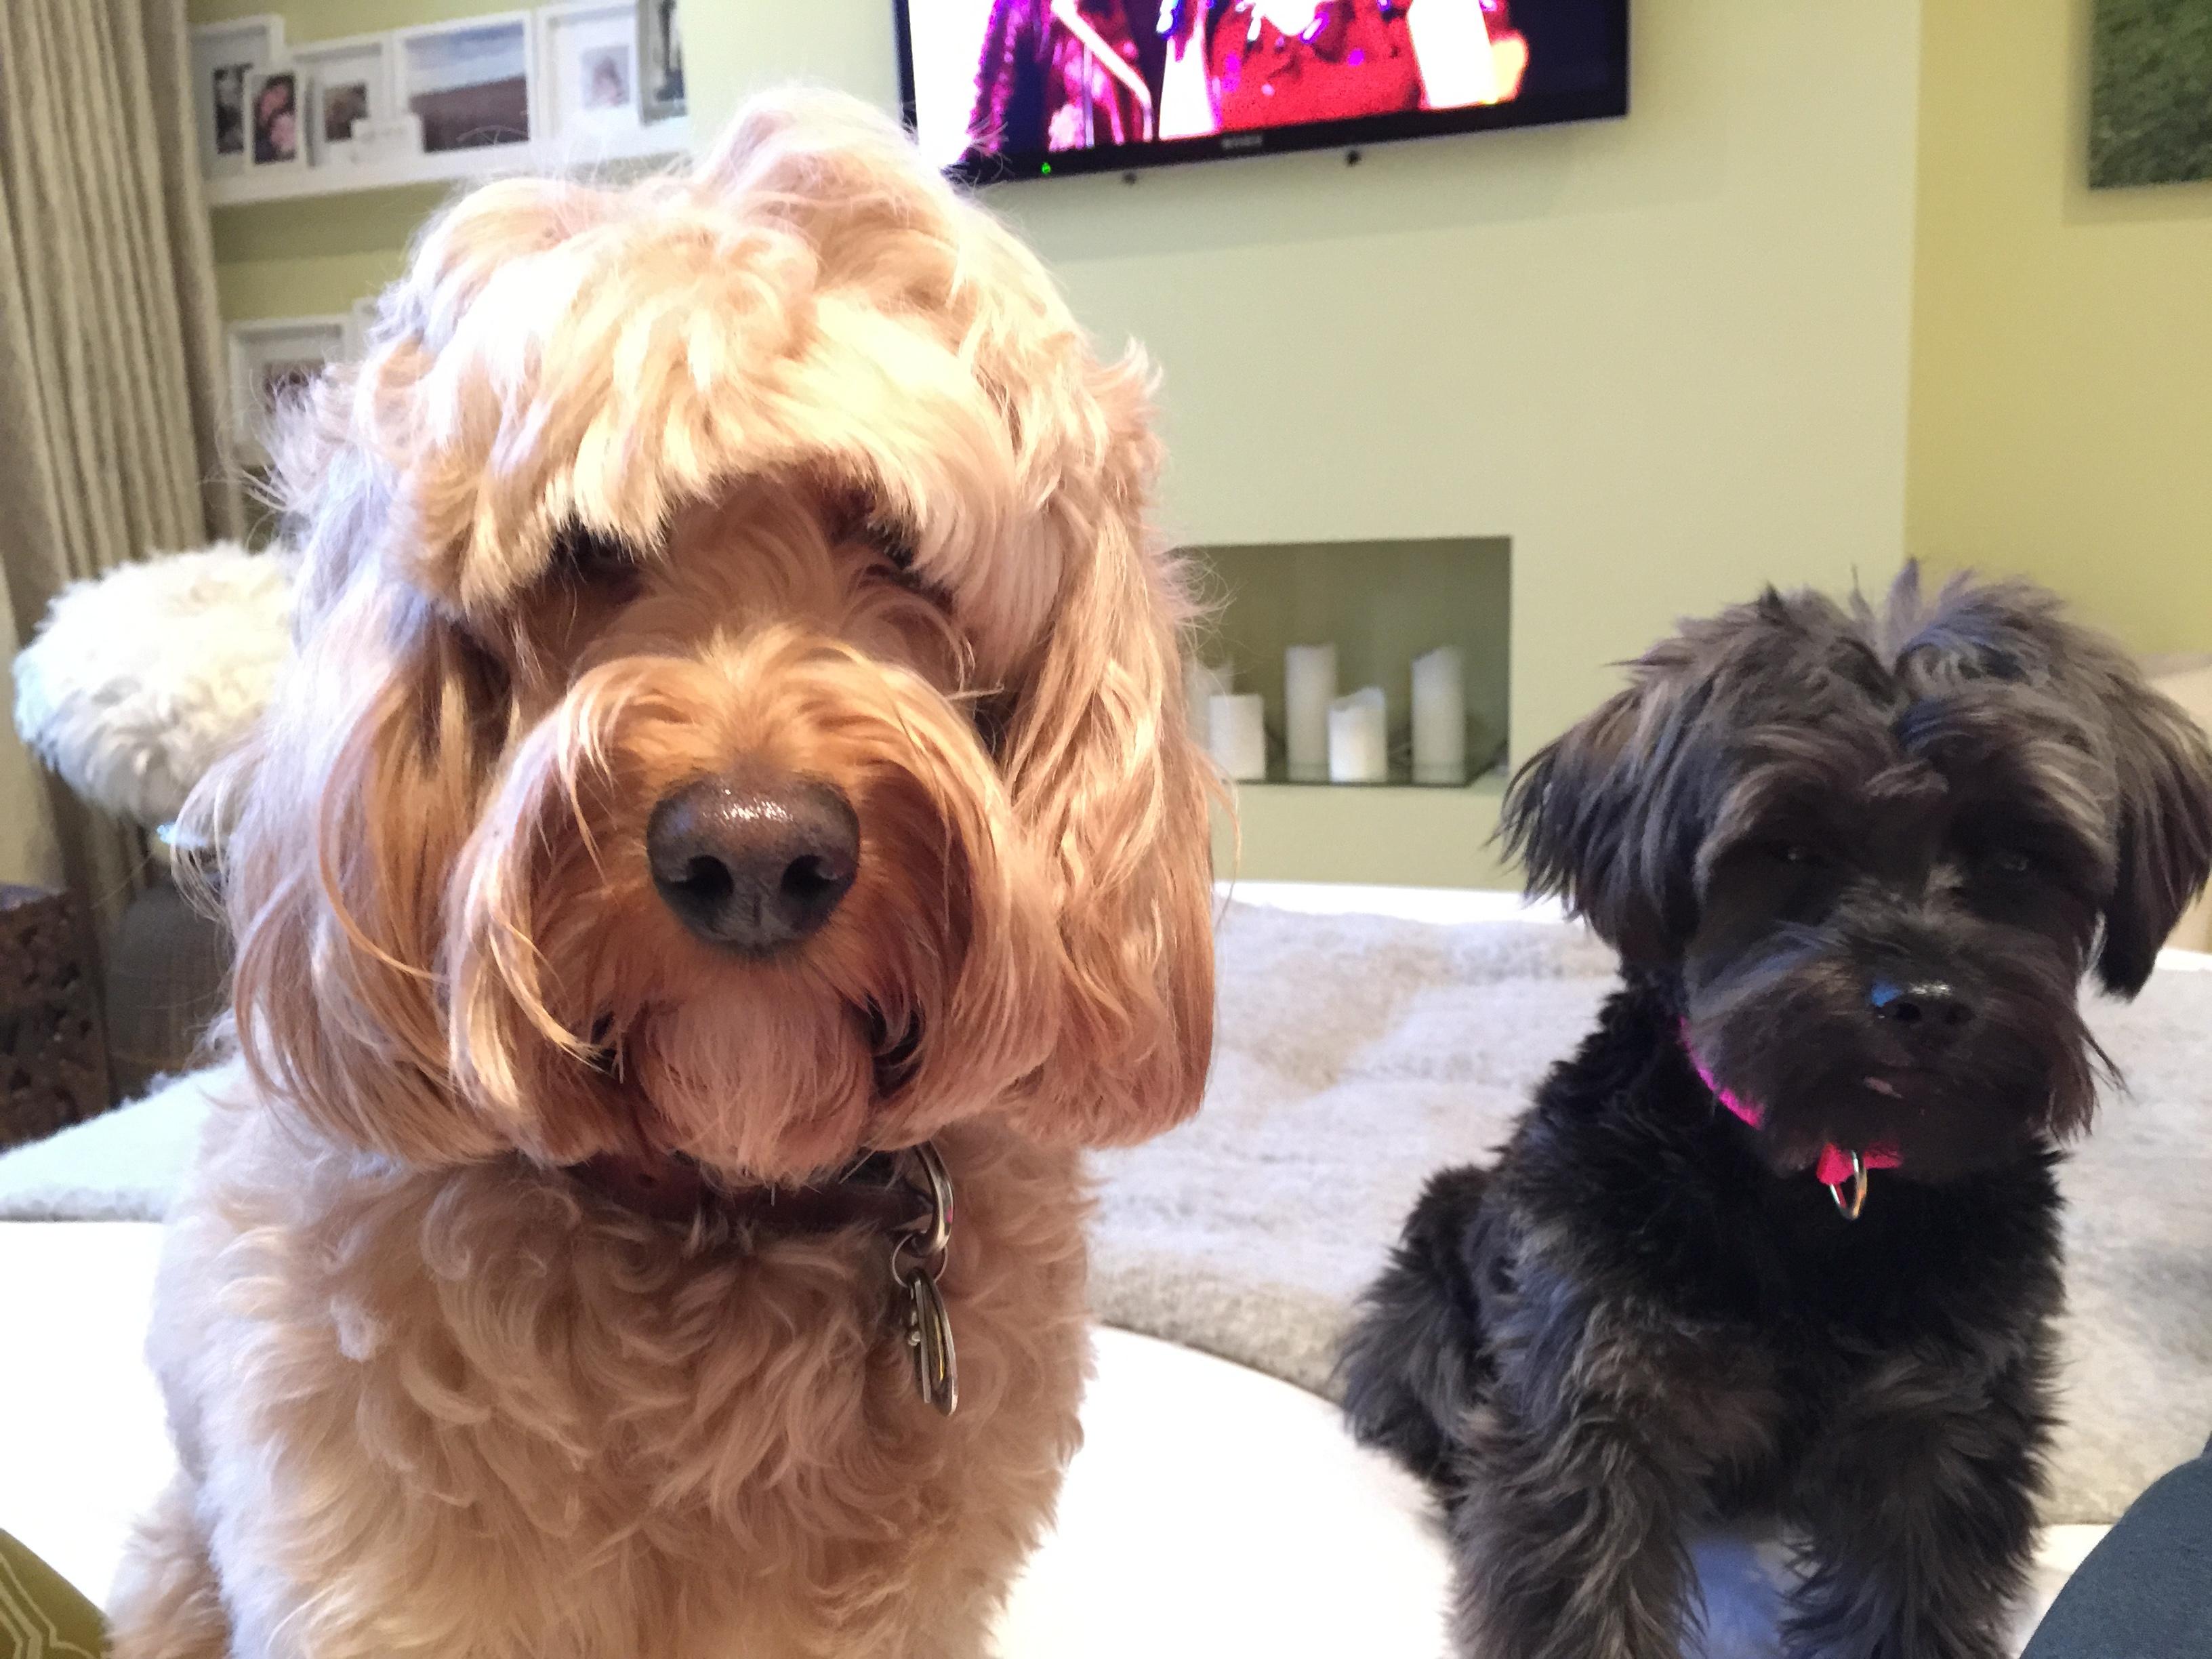 Shaggy Dog Grooming Maple Grove Mn